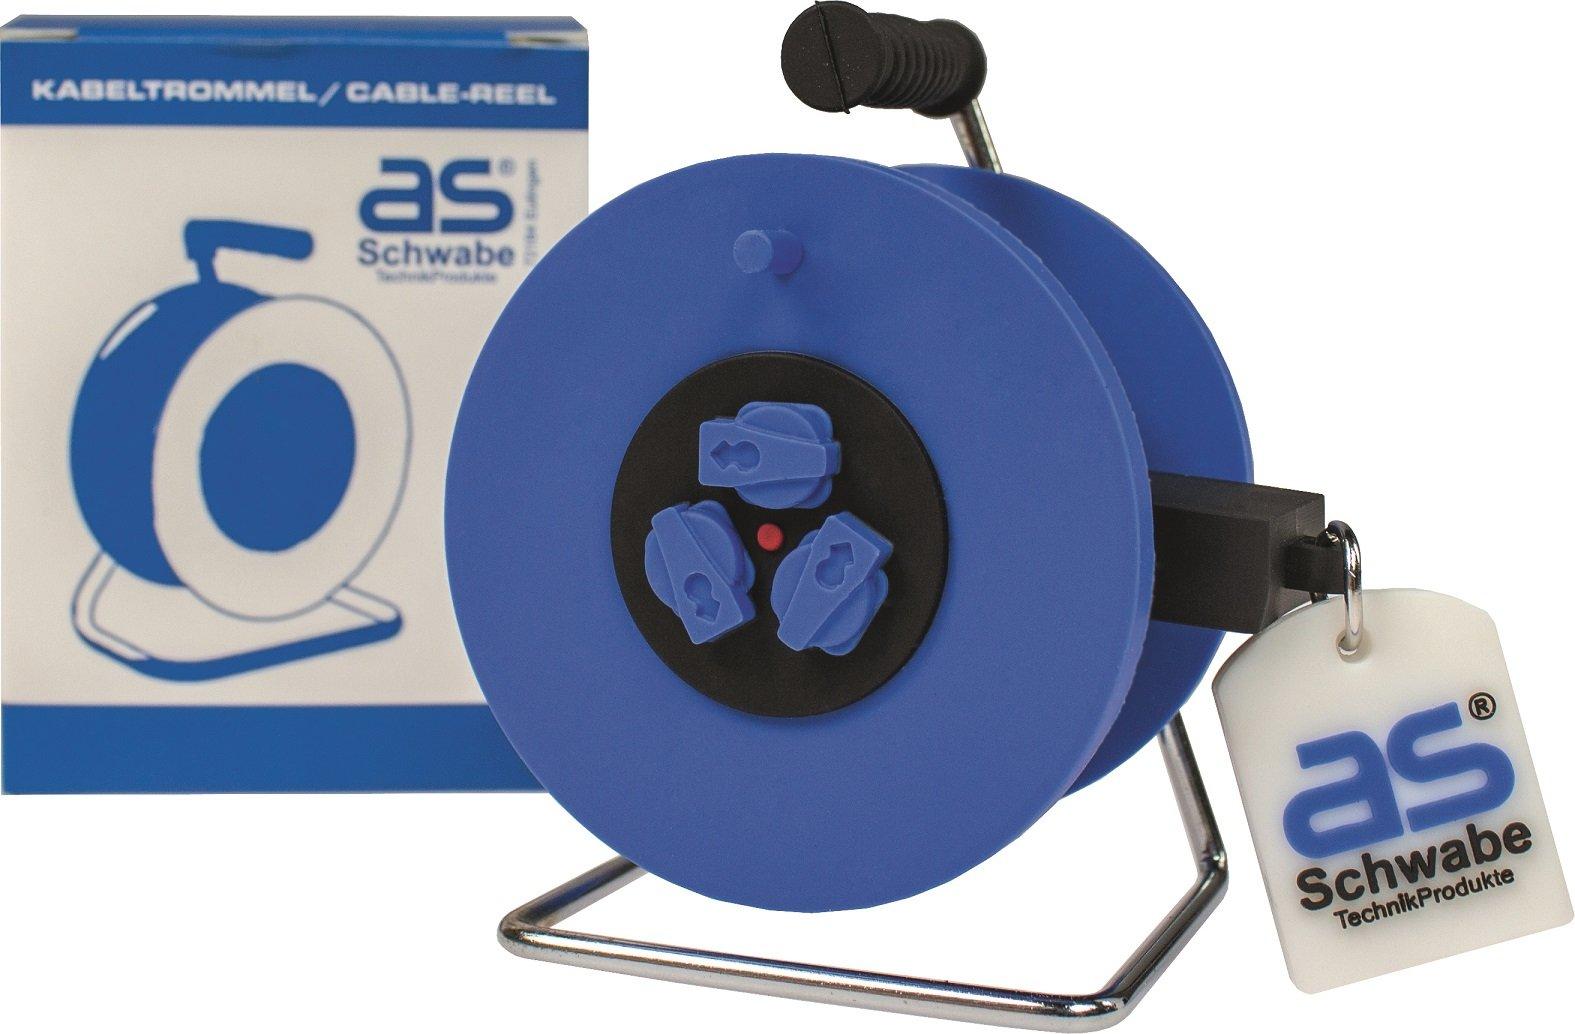 AS - Schwabe 99458 线卷 2 GB USB 2.0 闪存盘*棒,赠送电工的趣味礼物,蓝色